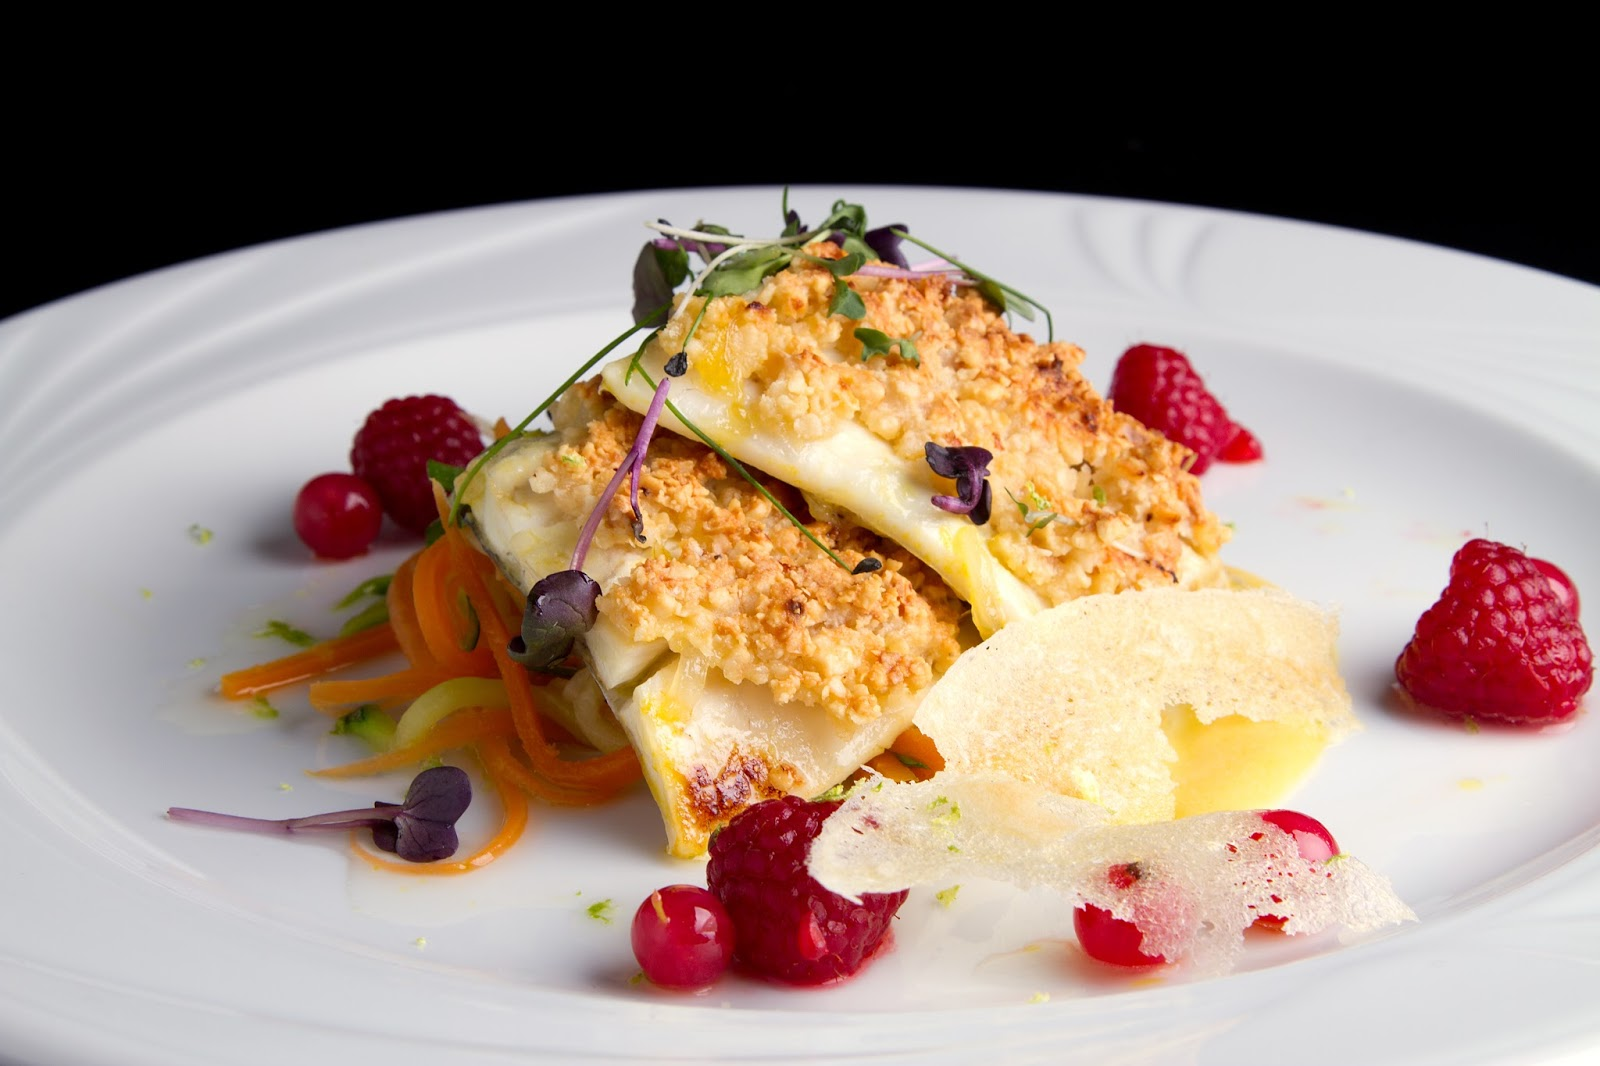 Concurso de cocina hosteler a y turismo alpaj s for Cocina hosteleria